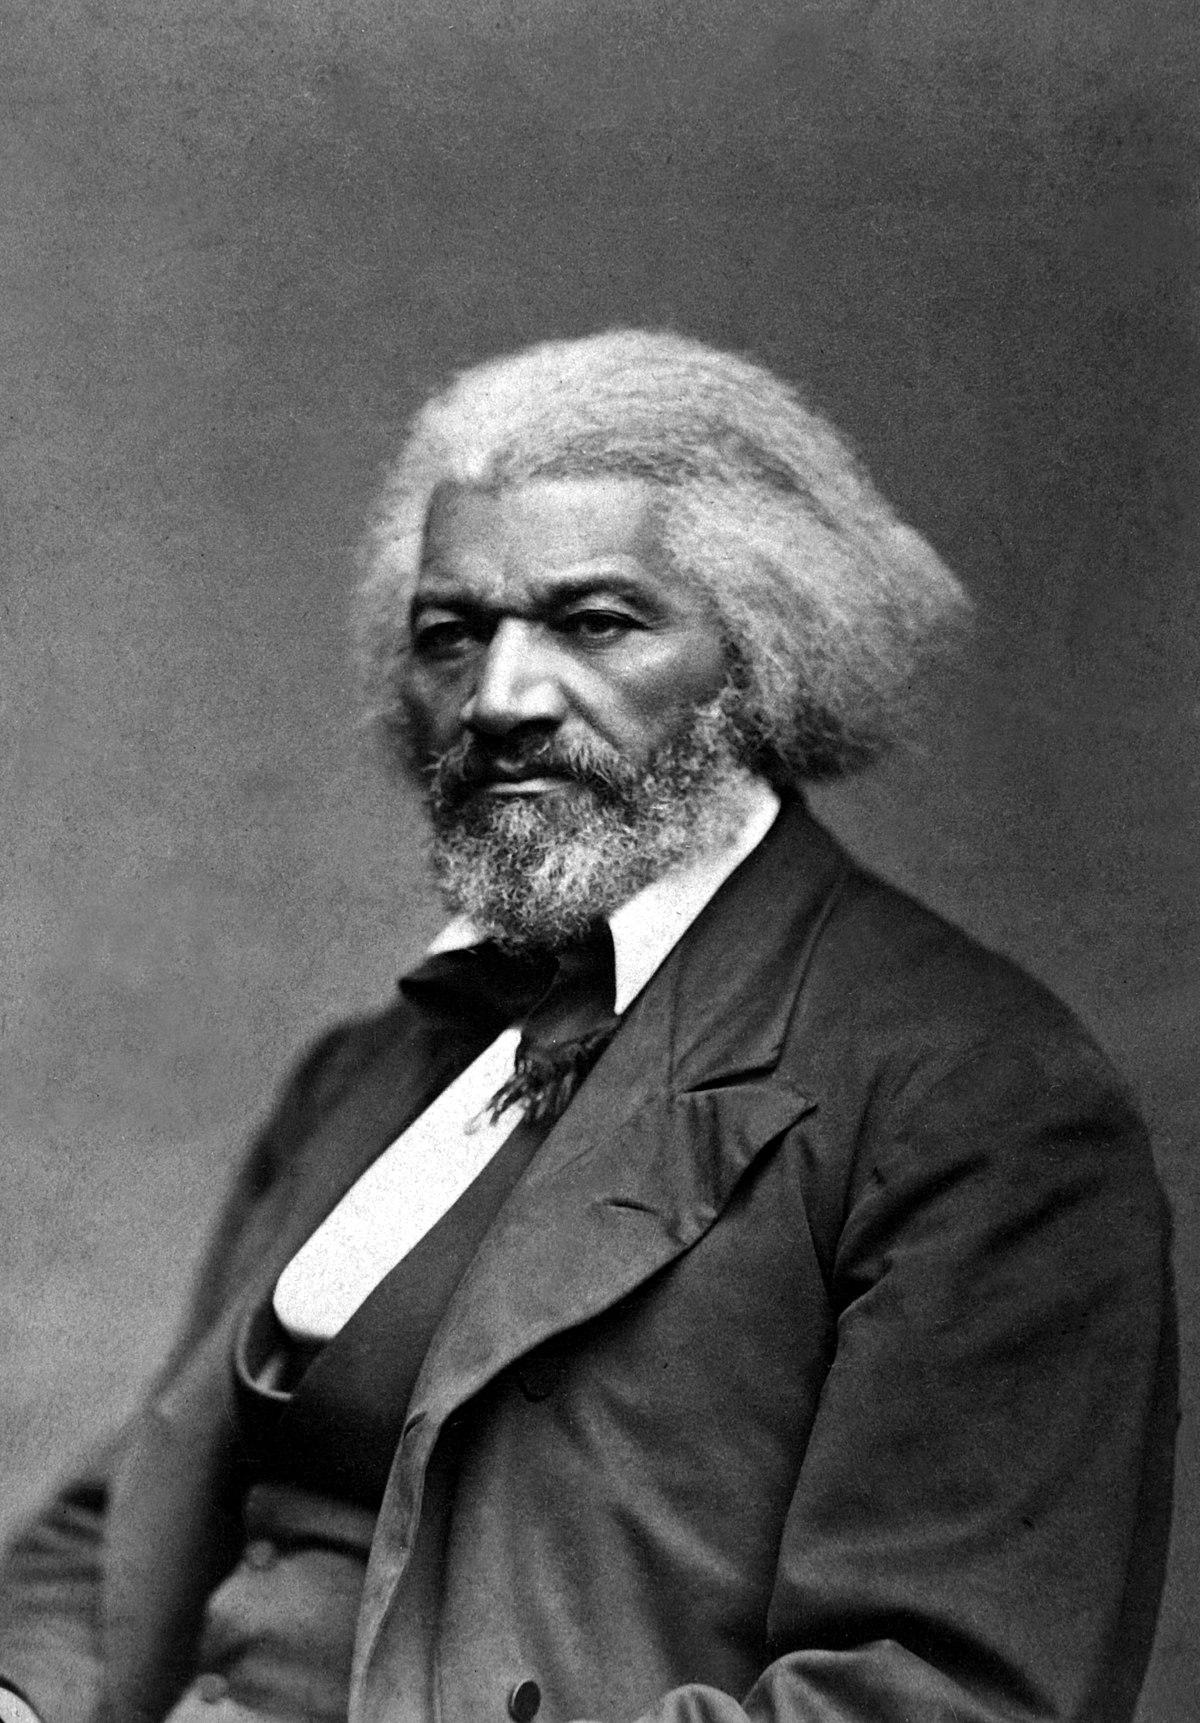 1200px-Frederick_Douglass_(circa_1879).jpg